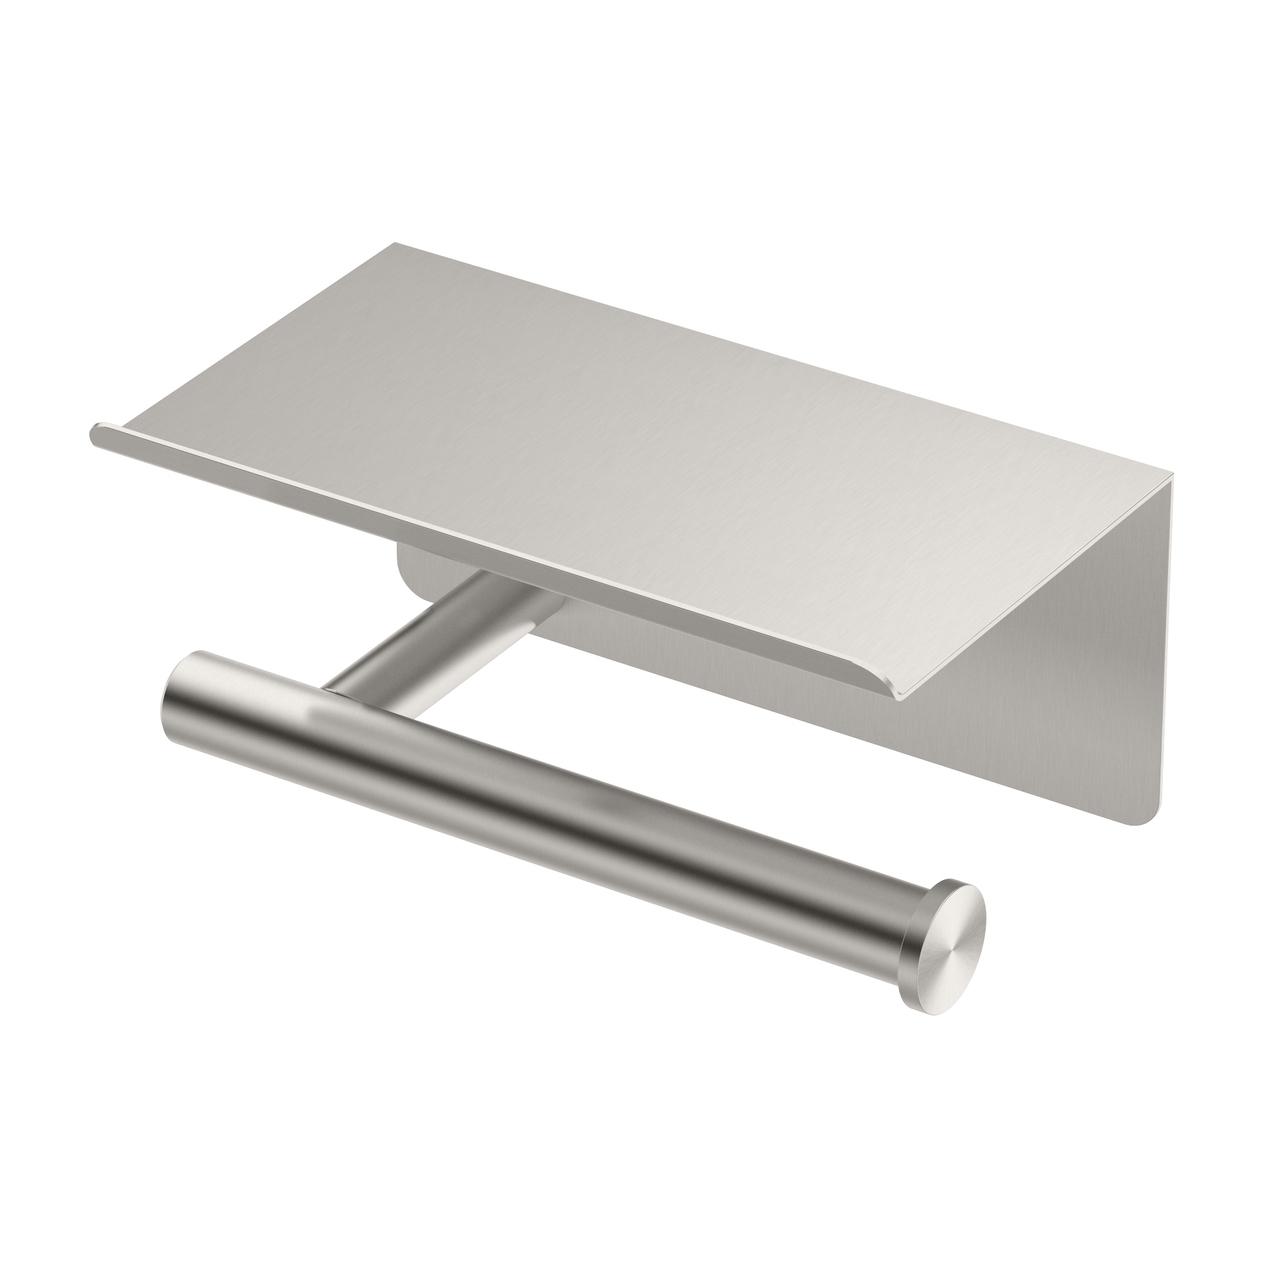 Latitude2 Tissue Holder with Mobile Shelf in Satin Nickel